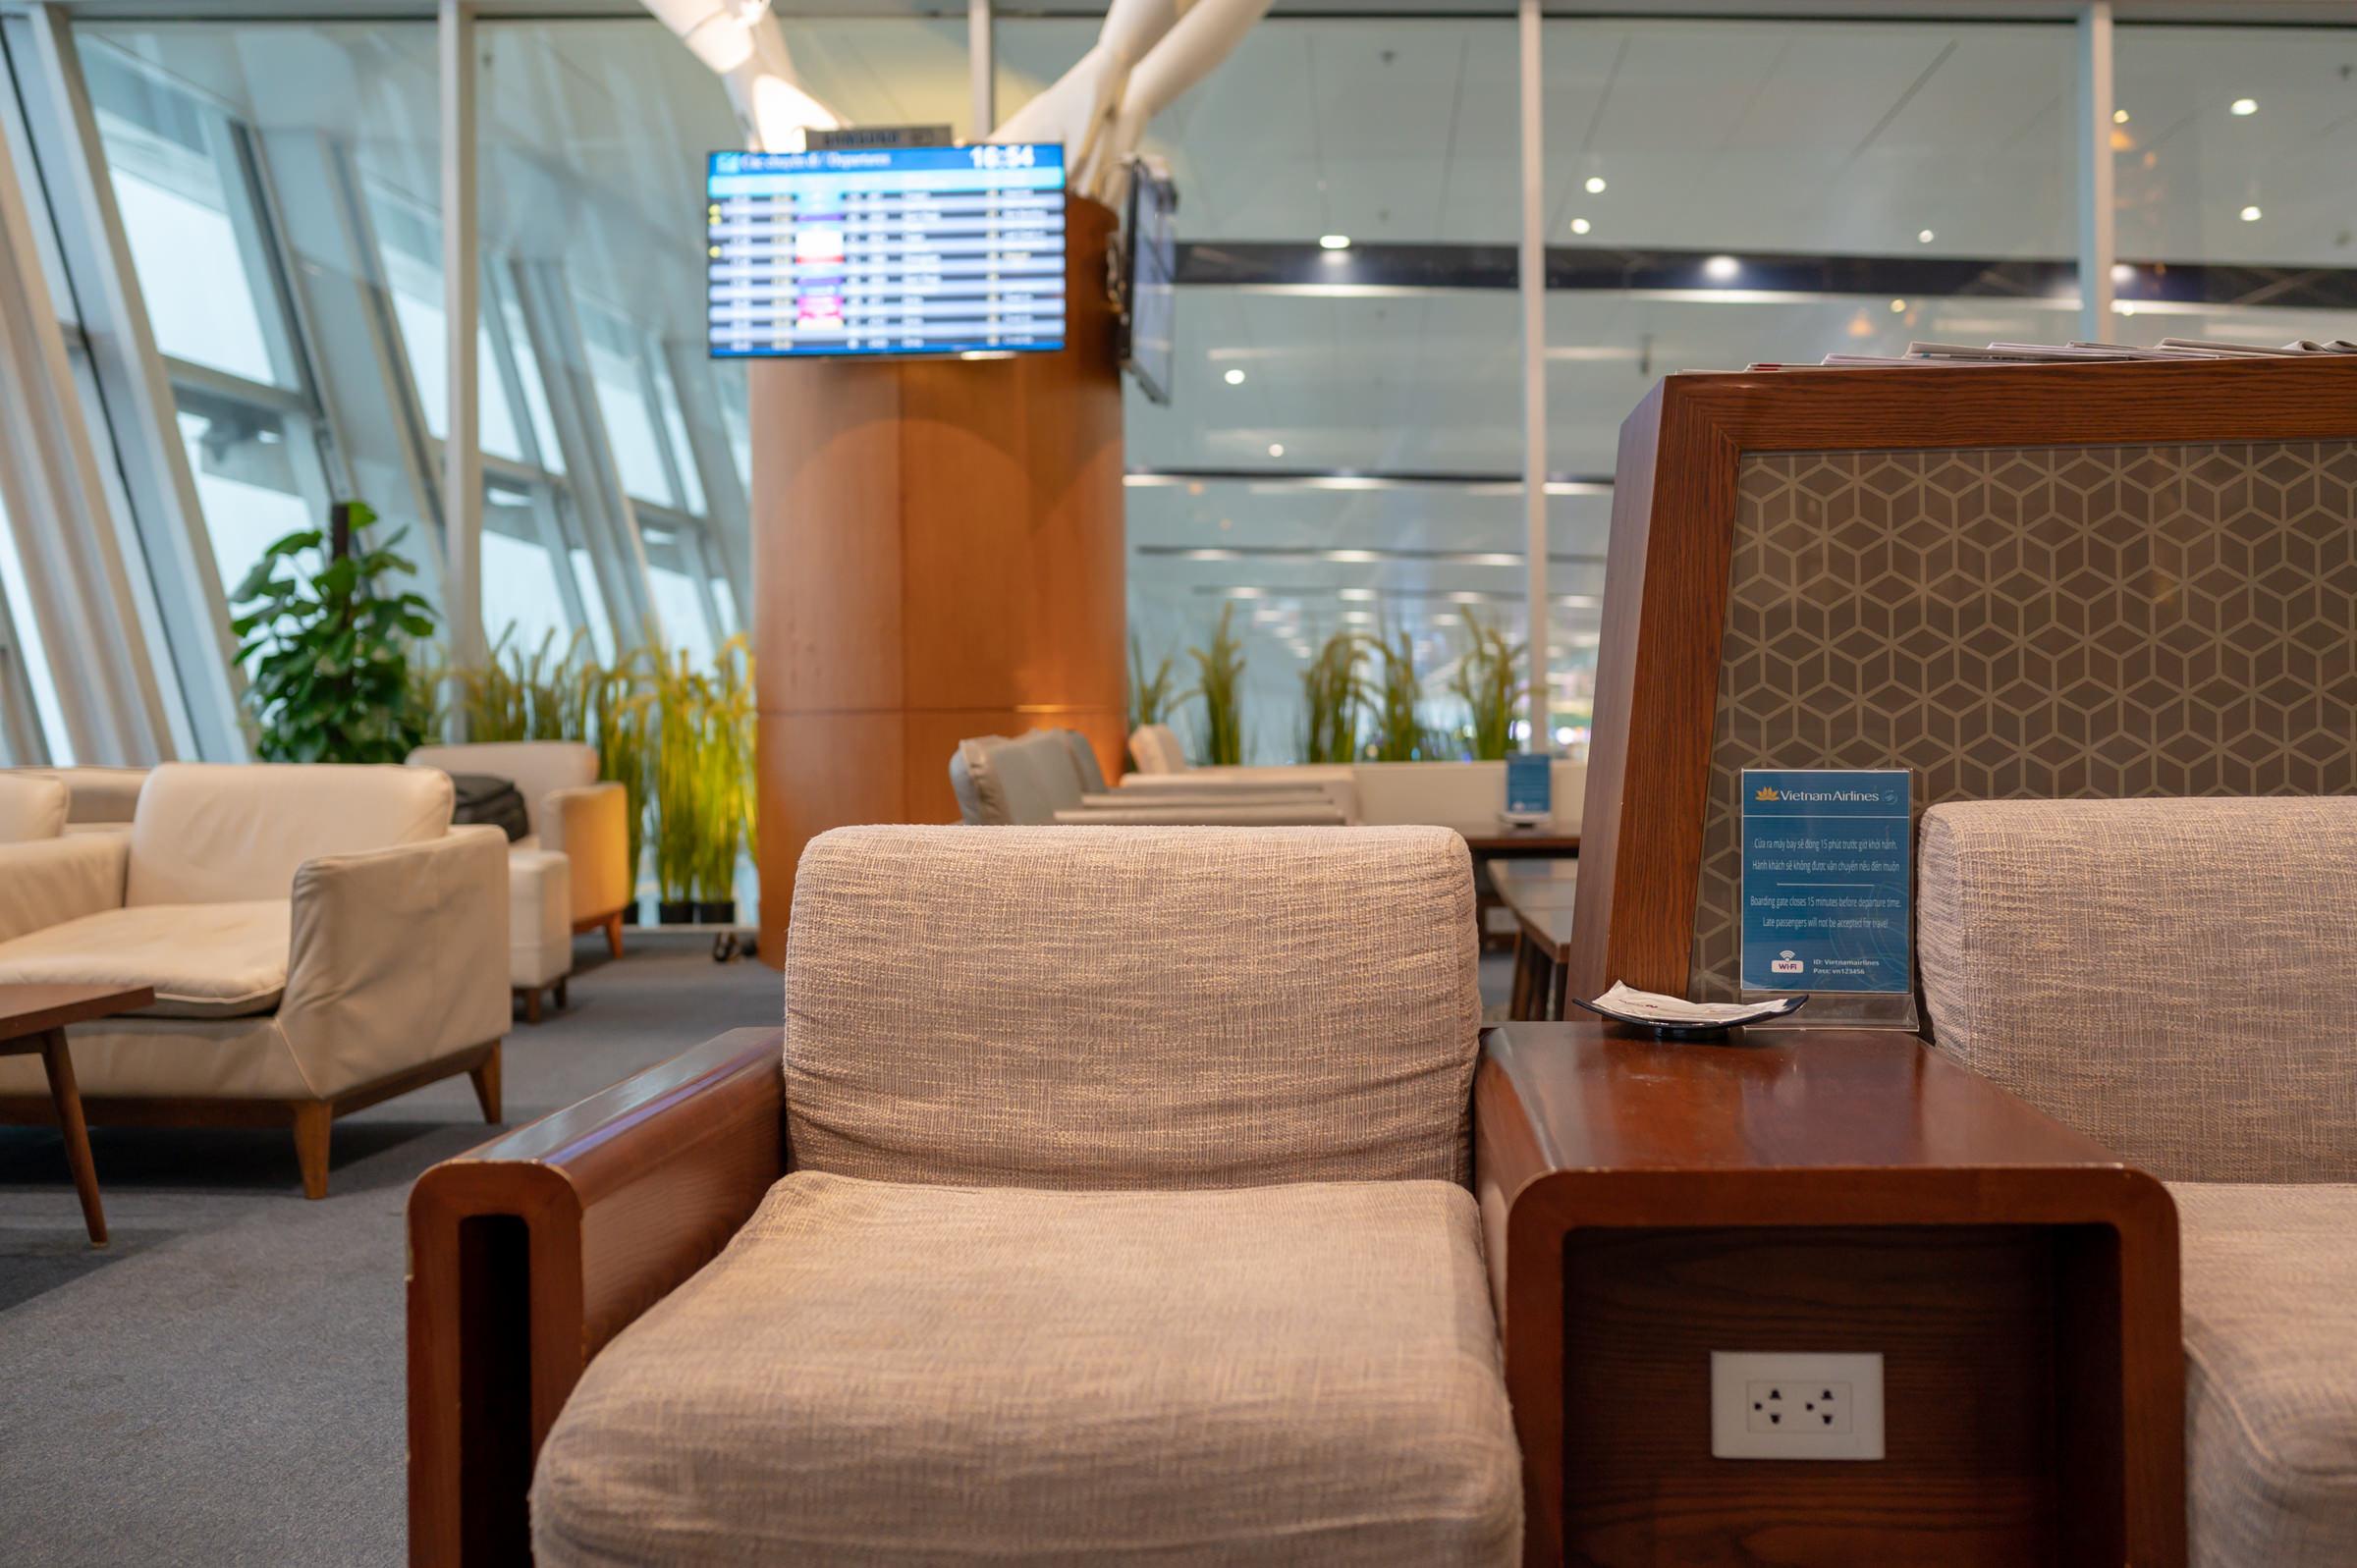 Power Outlets  Vietnam Airlines Lotus Lounge - Noi Bai International Airport